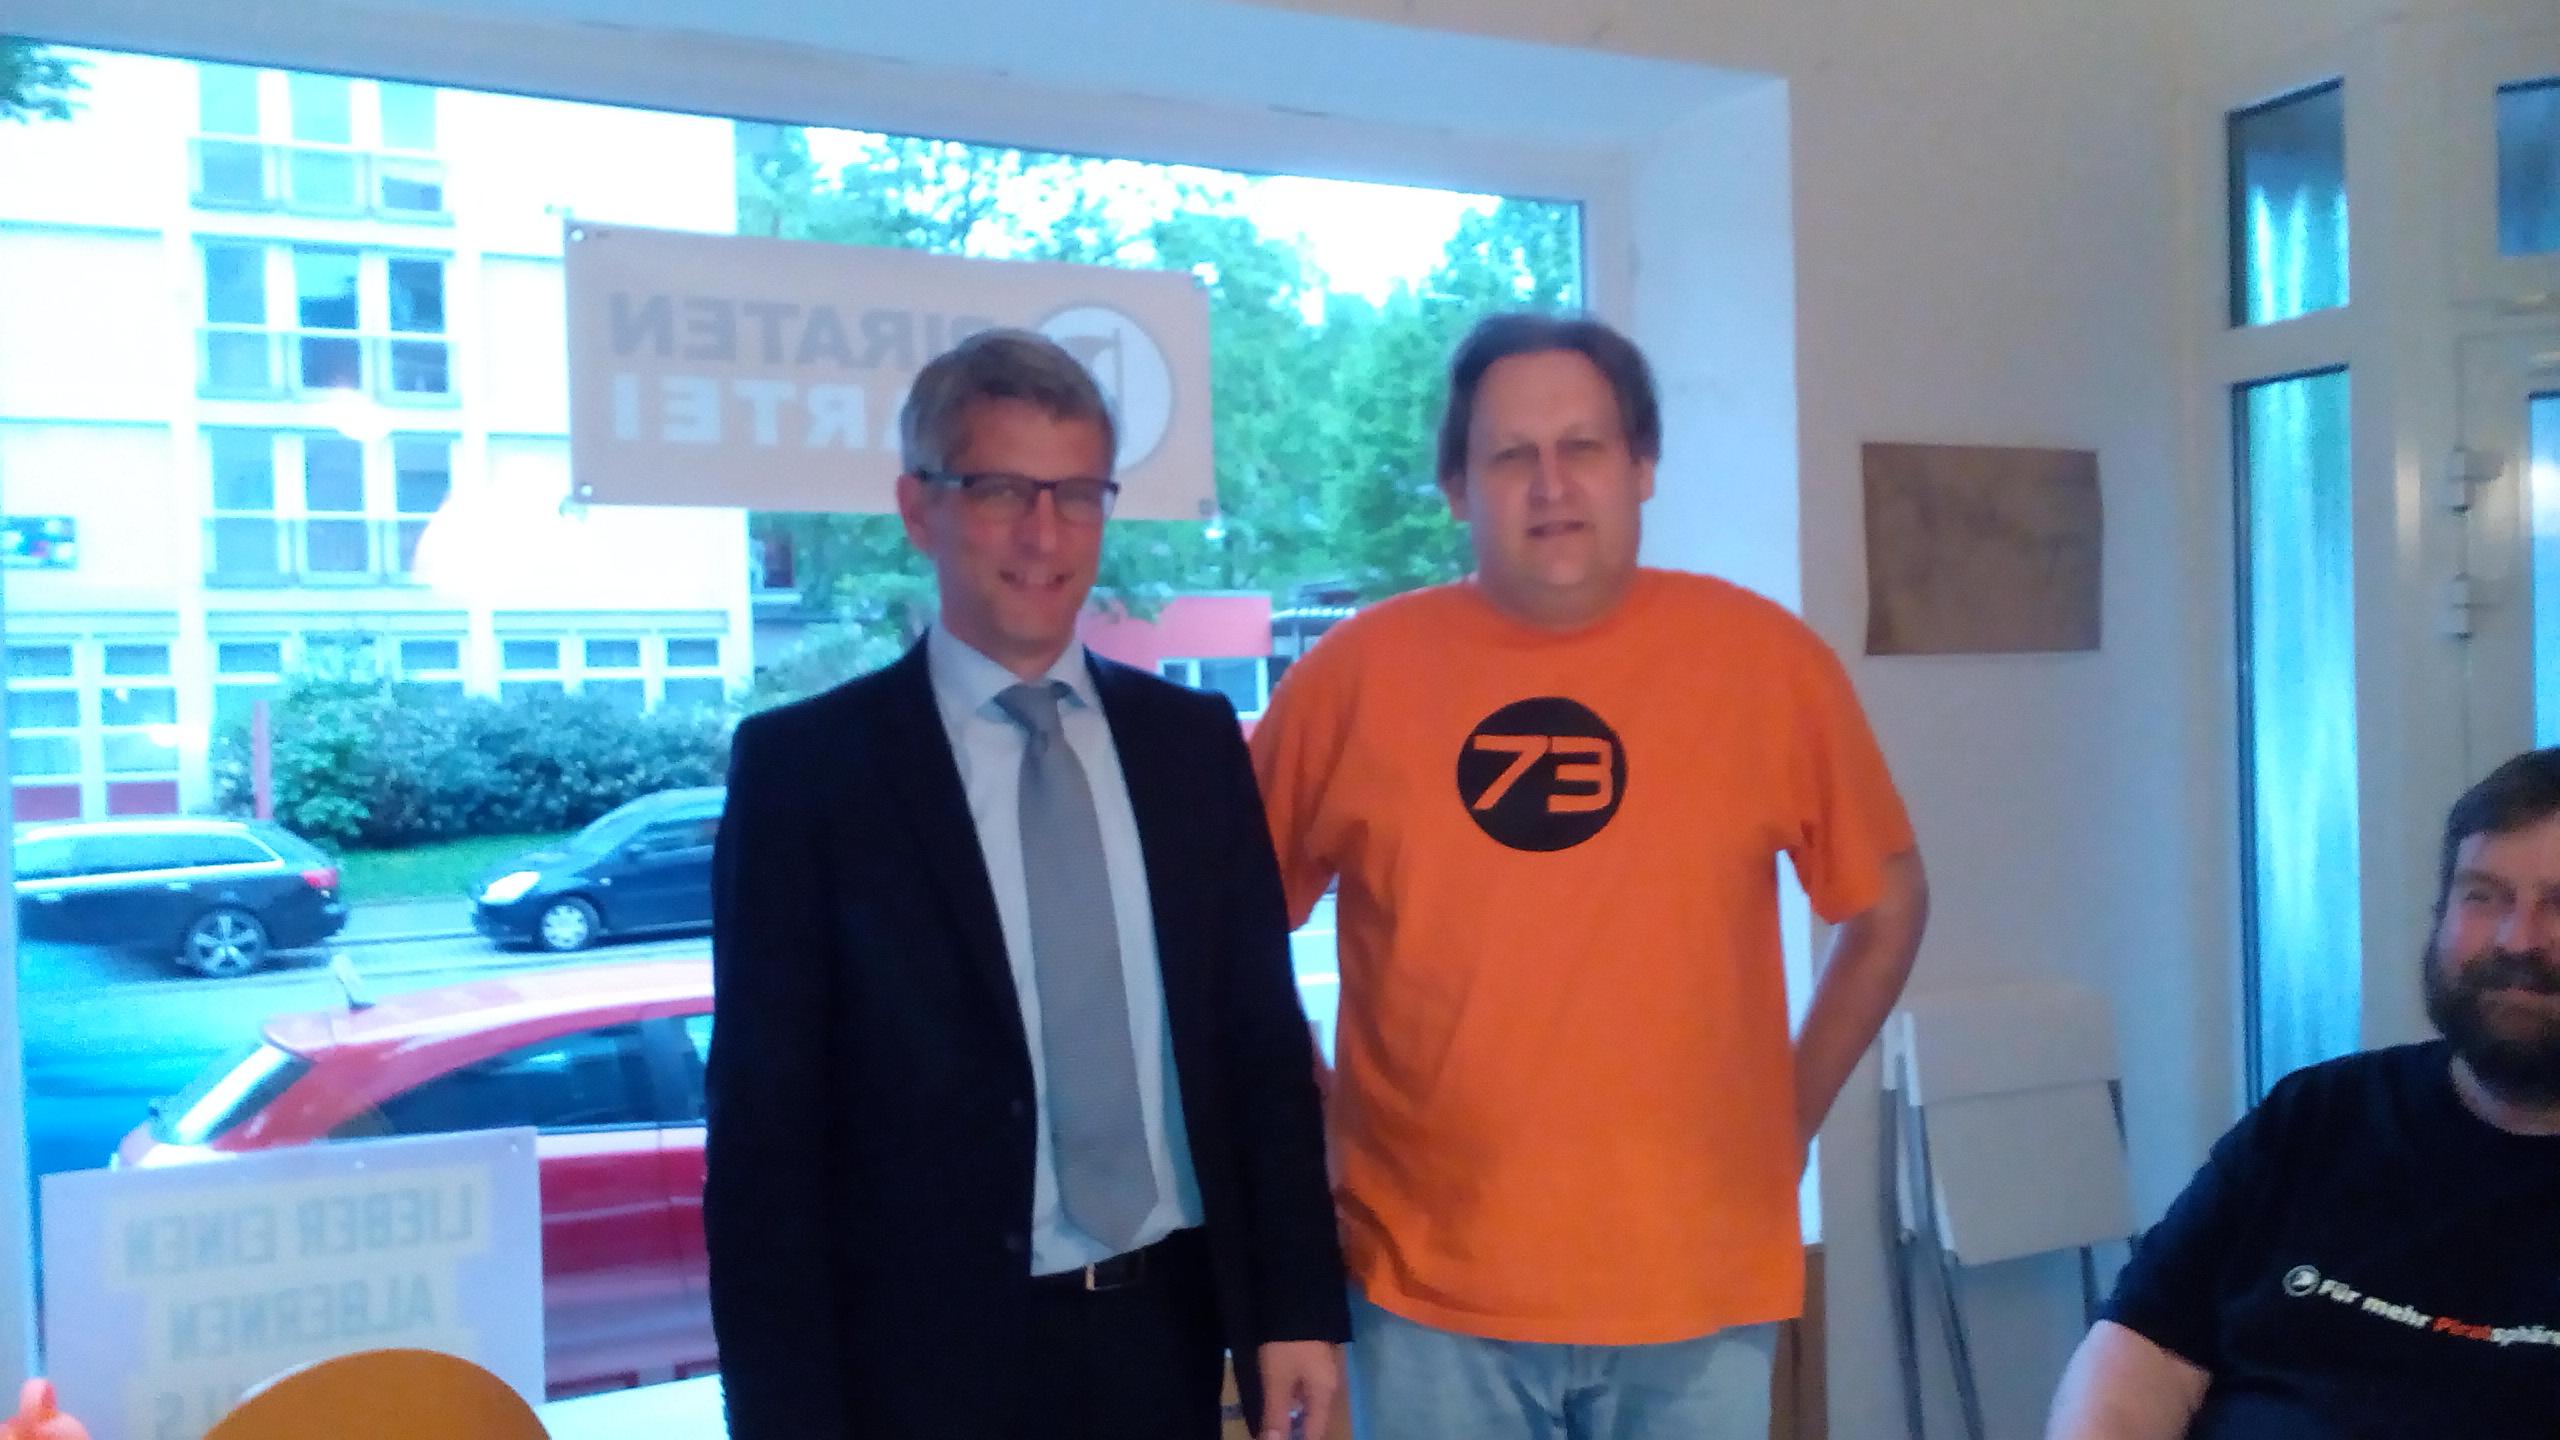 OB-Kandidat Erik O. Schulz mit Spitzenkandidat Thorsten Kiszkenow